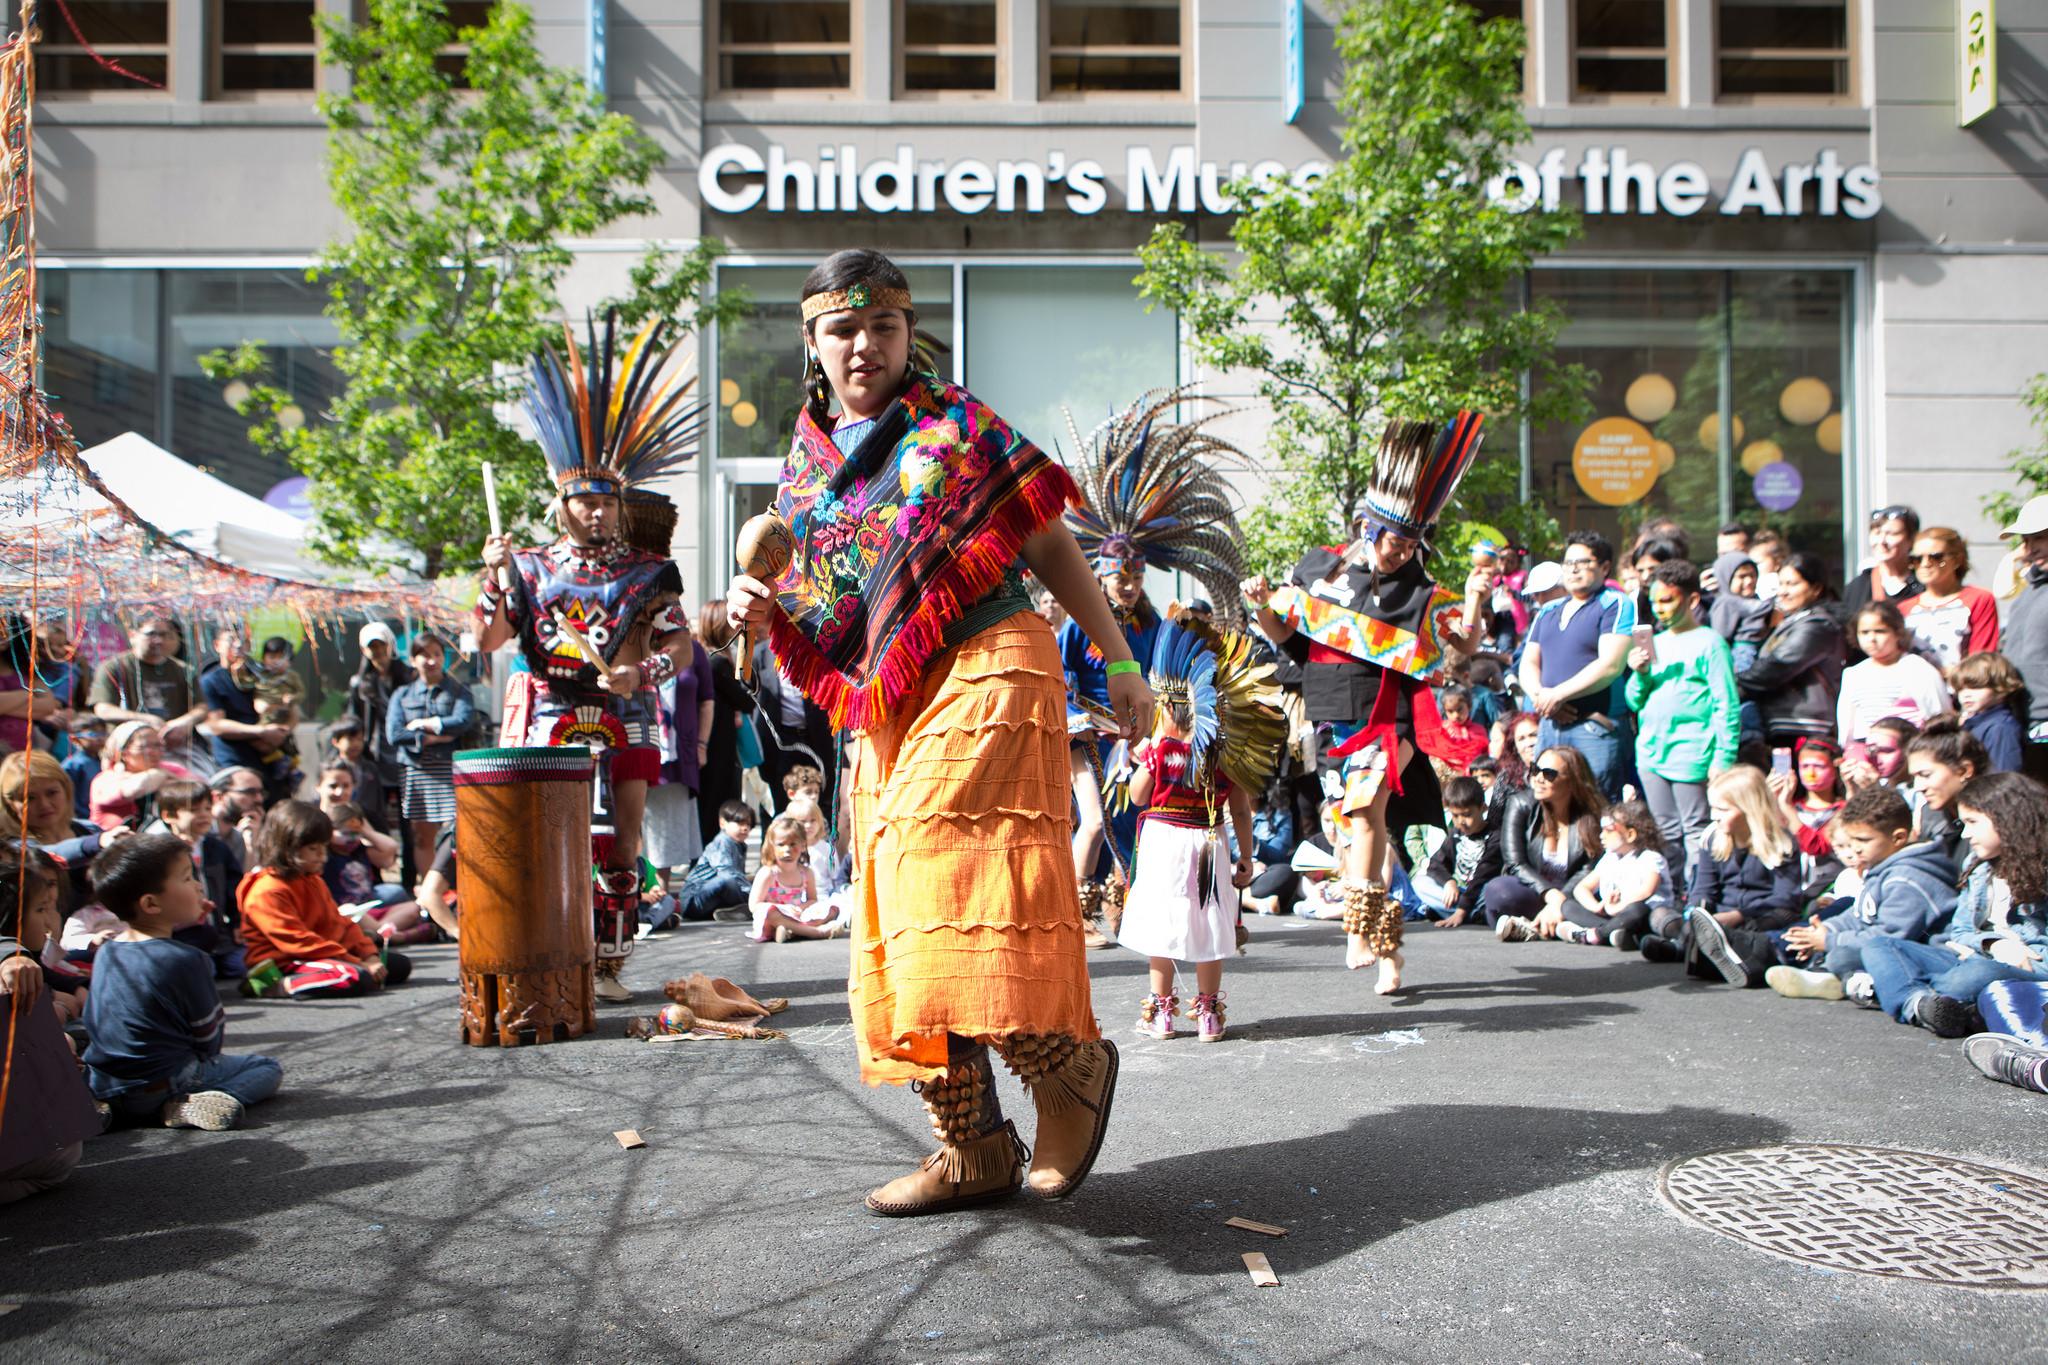 Kalpulli Huehuetlahtolli, a Danza Mexica group performing at CMA Kids Fair 2016